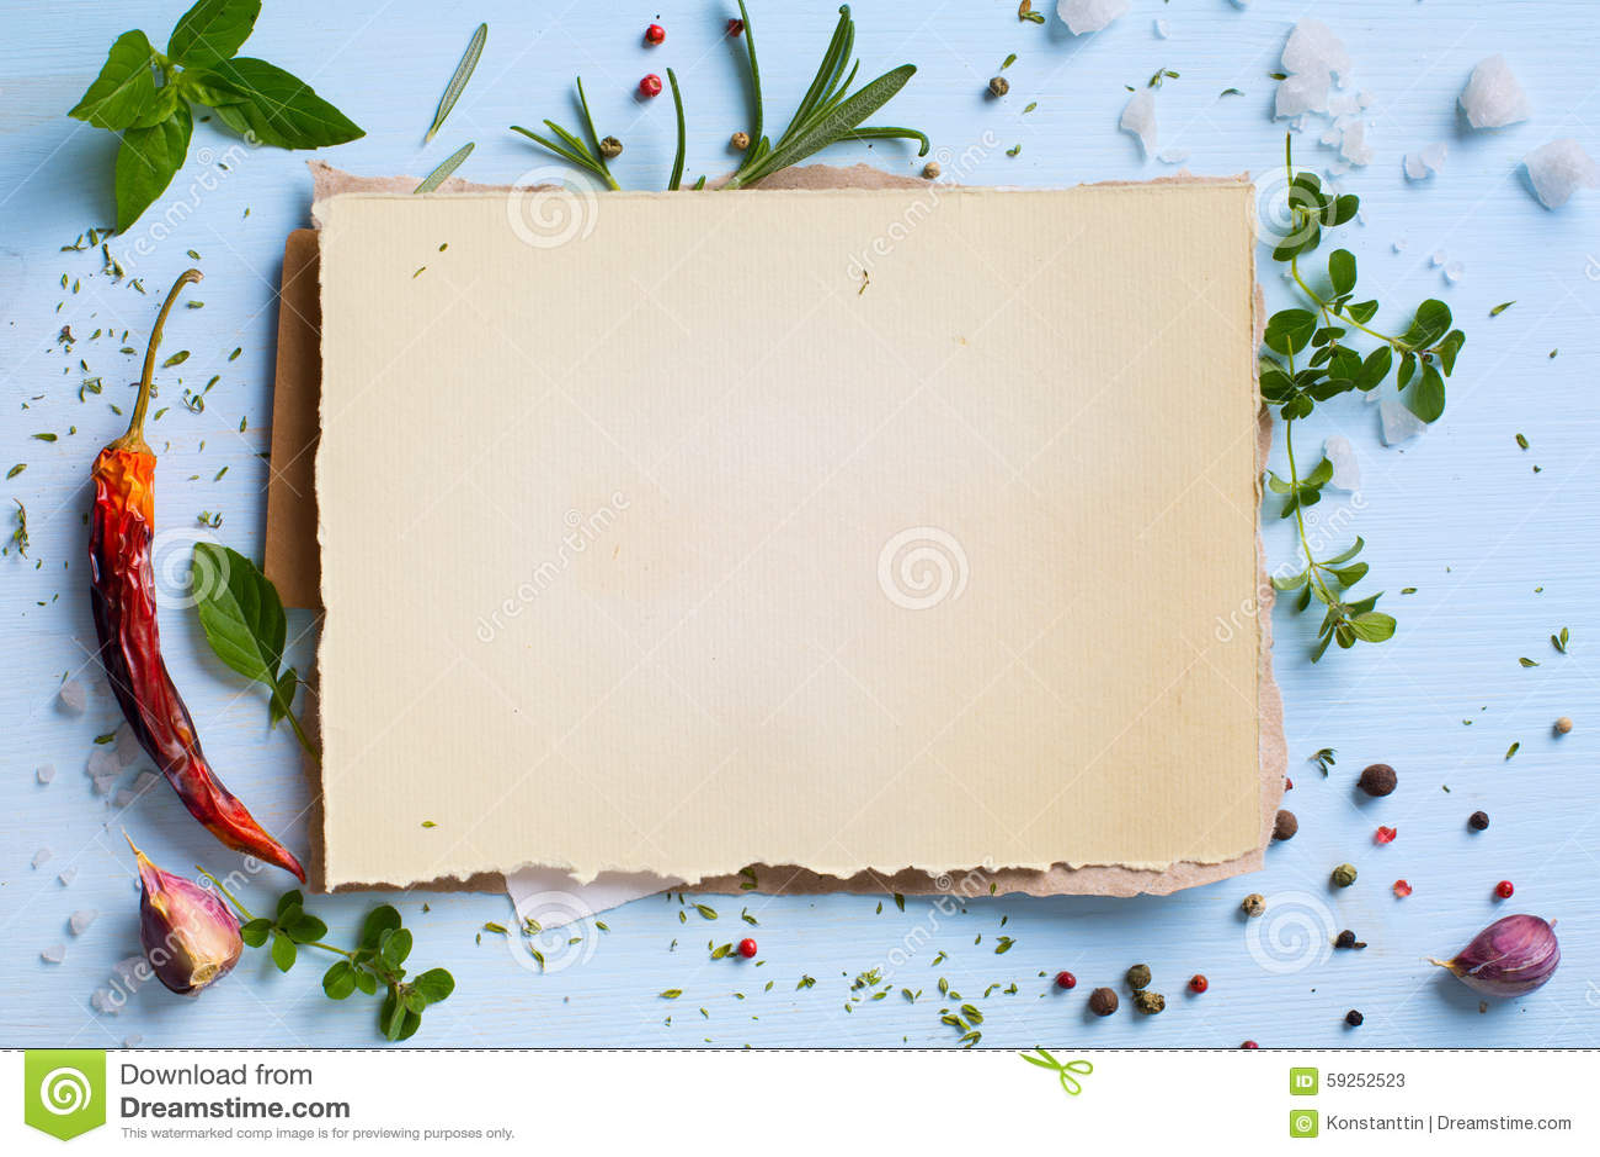 Art Italian Homemade Menu Food Background Restaurant Week Stock Photo Image 59252523